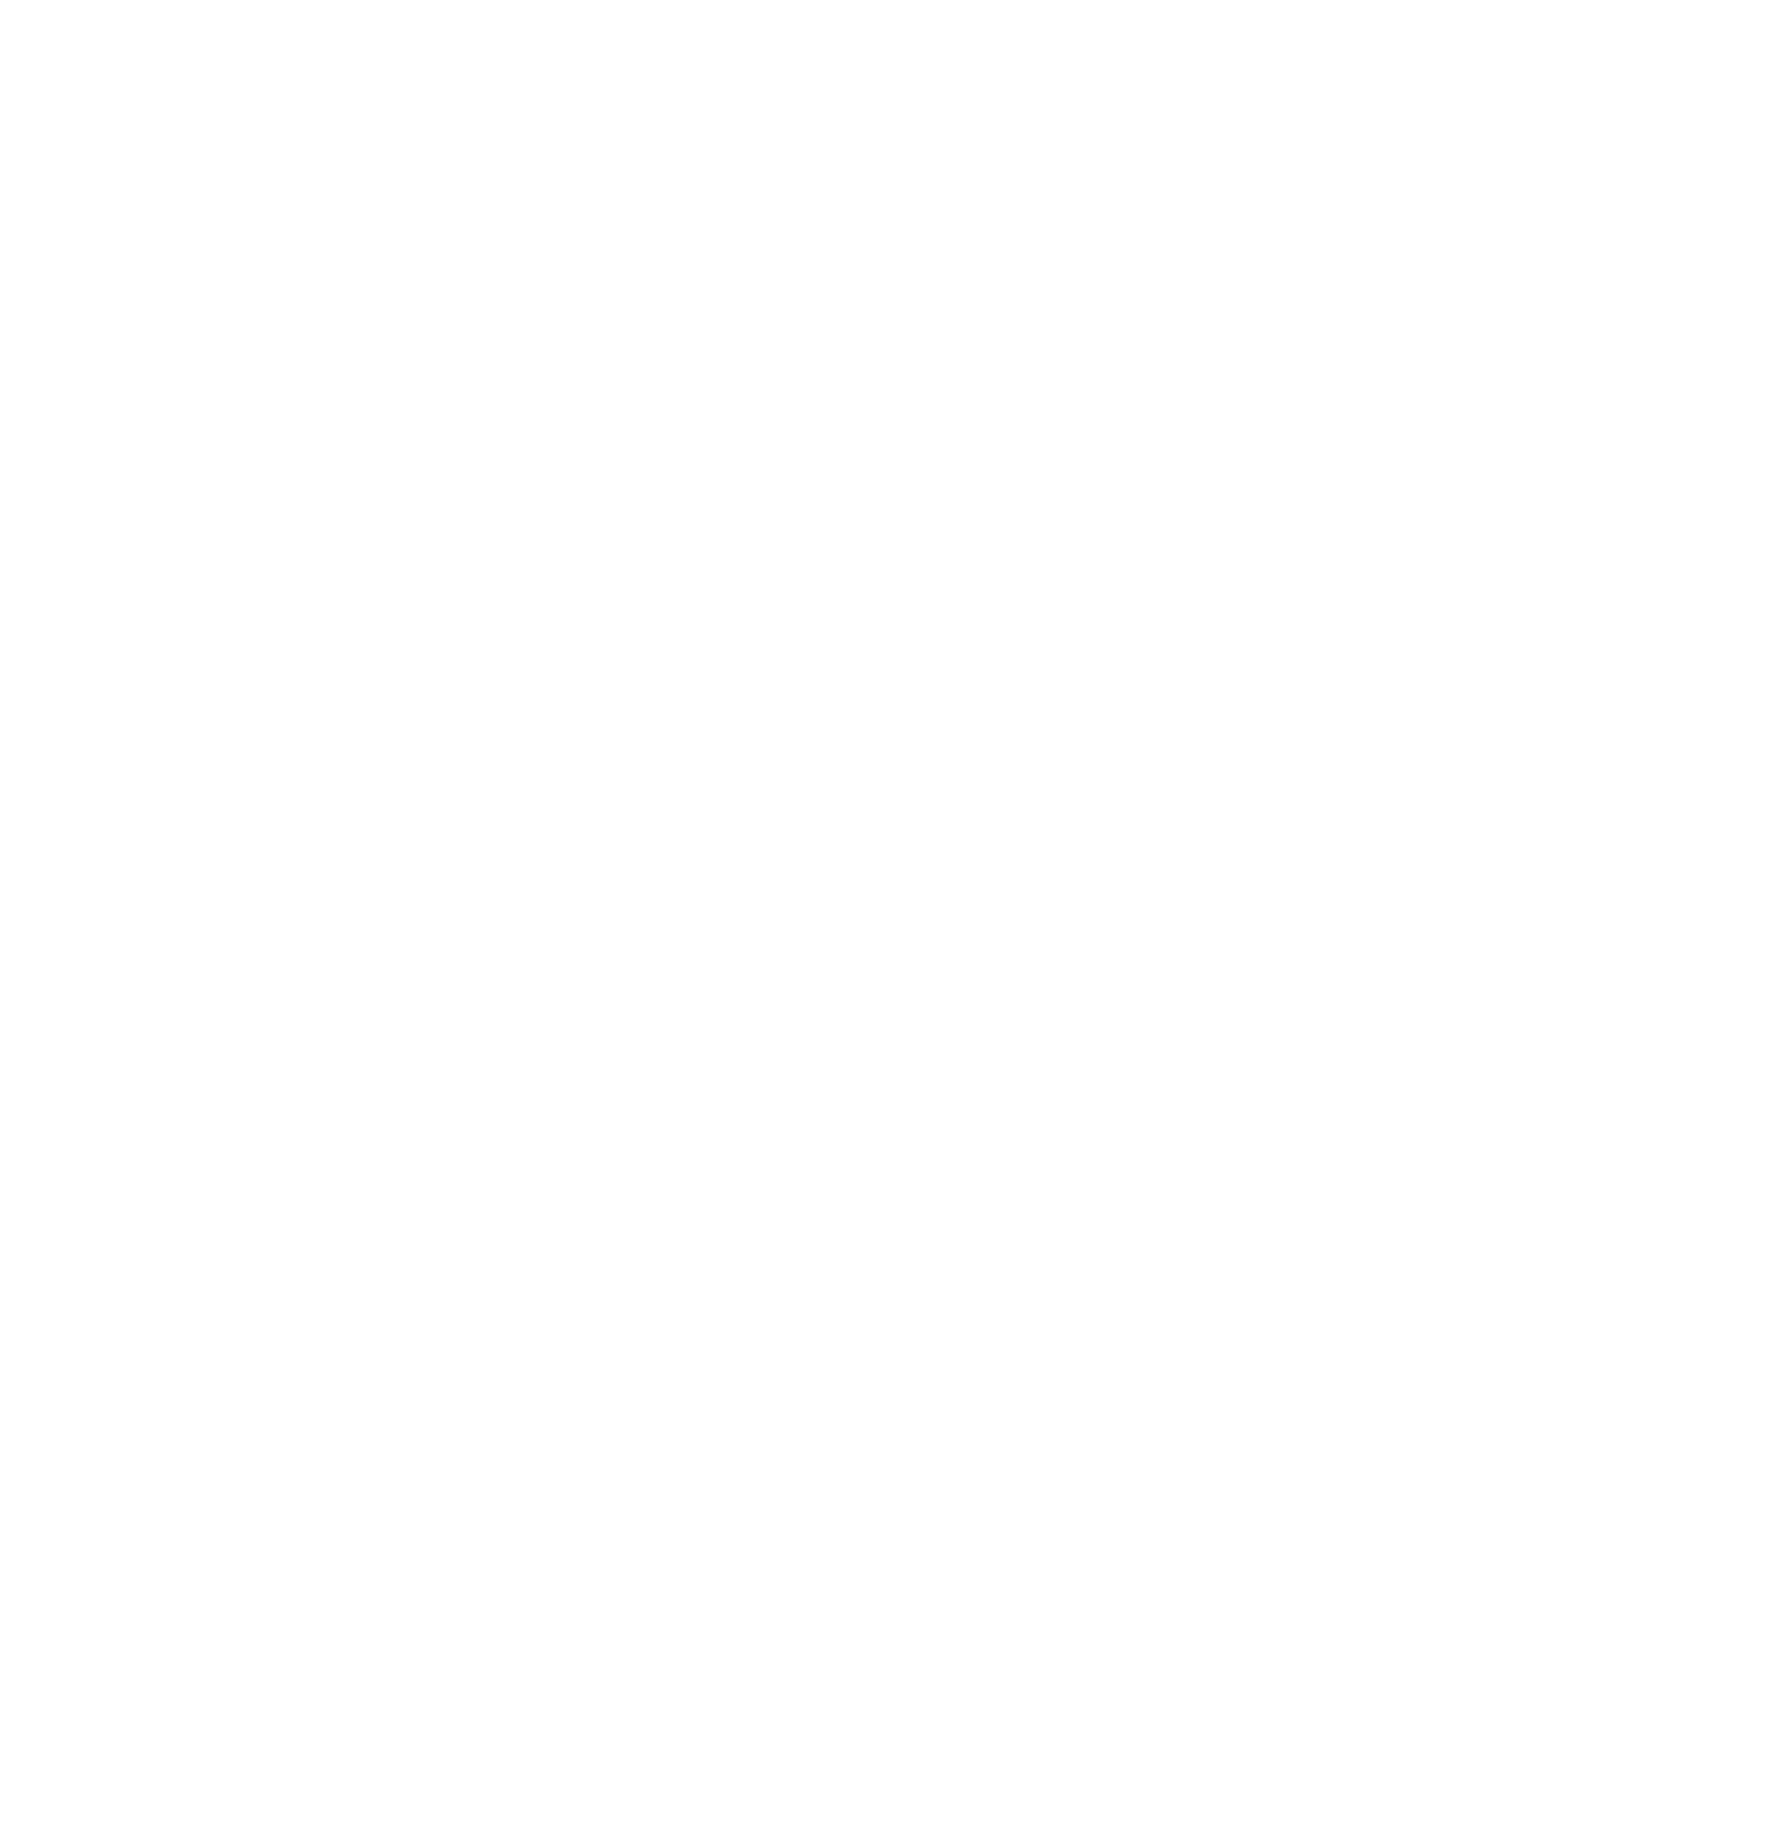 EC-logo-white